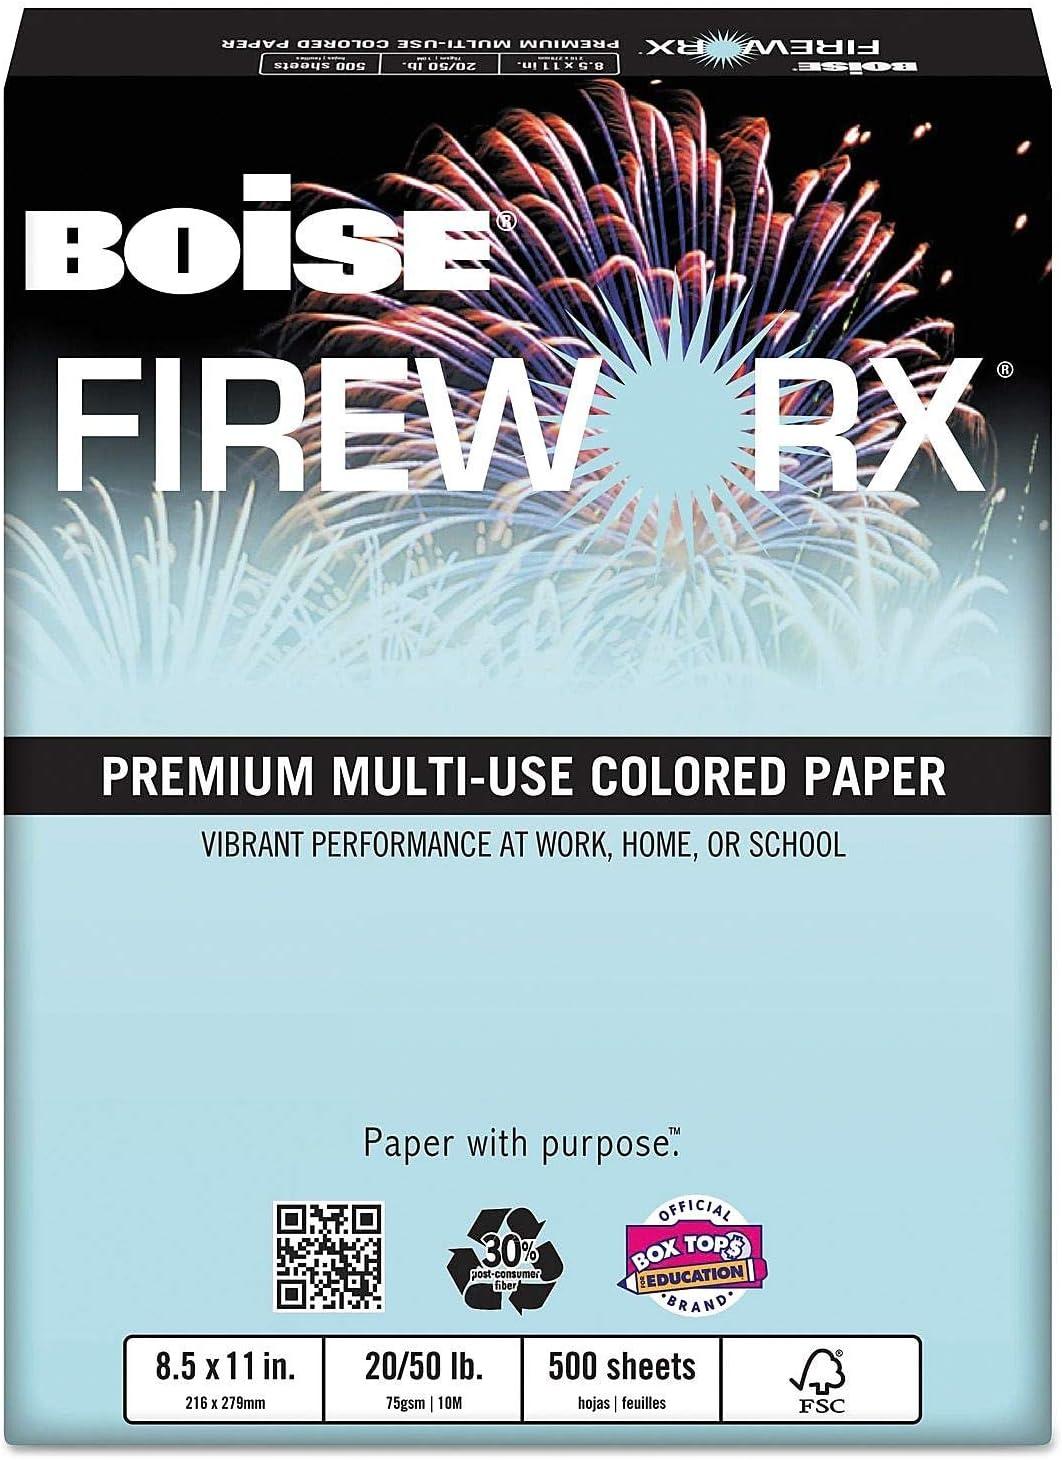 20lb Boise MP2204BE FIREWORX Colored Paper 500 Sheets//Ream Bottle Rocket Blue 8-1//2 x 14